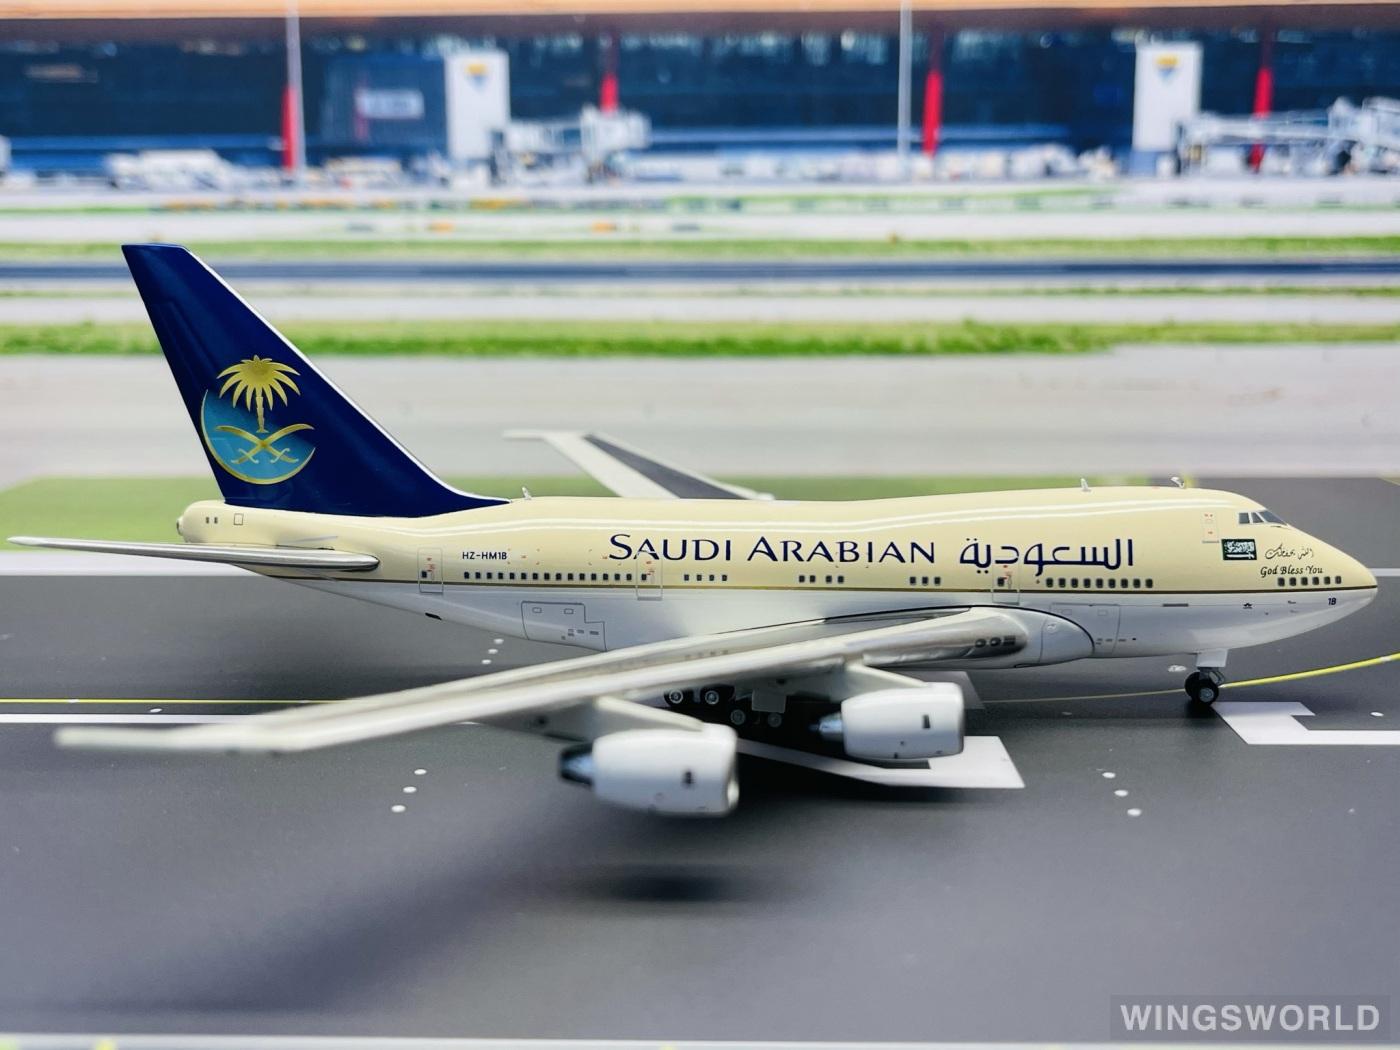 Geminijets 1:400 GJSVA1639 Saudia 沙特阿拉伯航空 Boeing 747SP HZ-HM1B